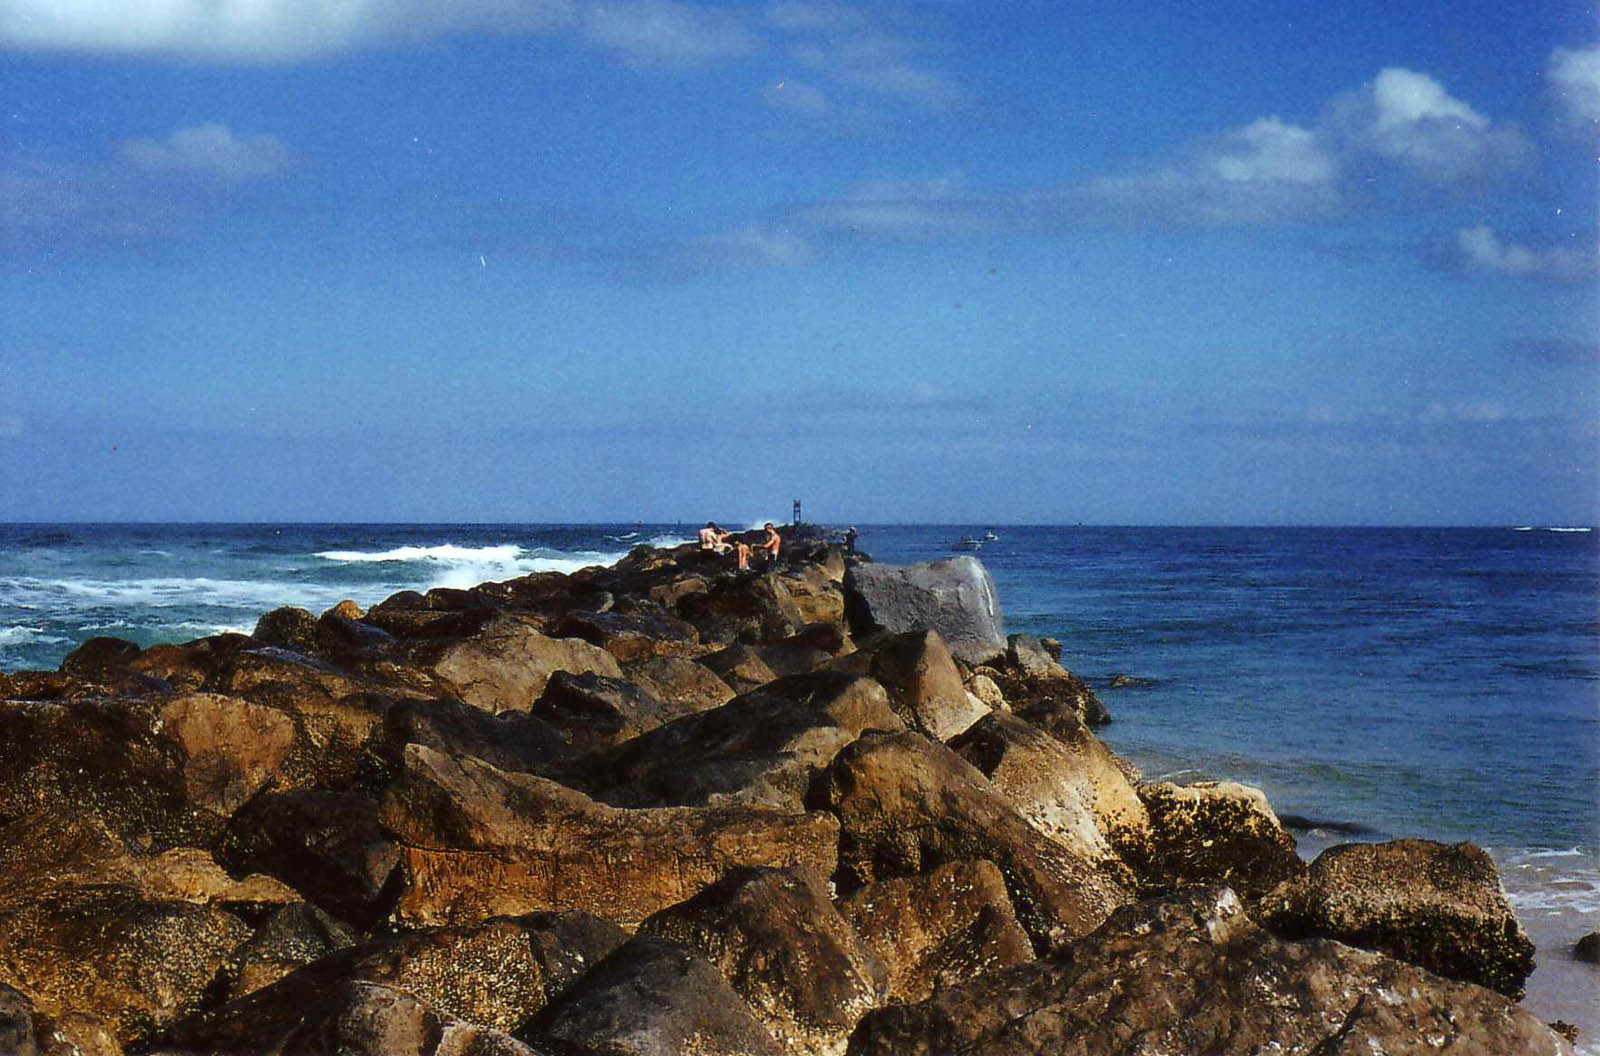 Ponce Inlet rocks